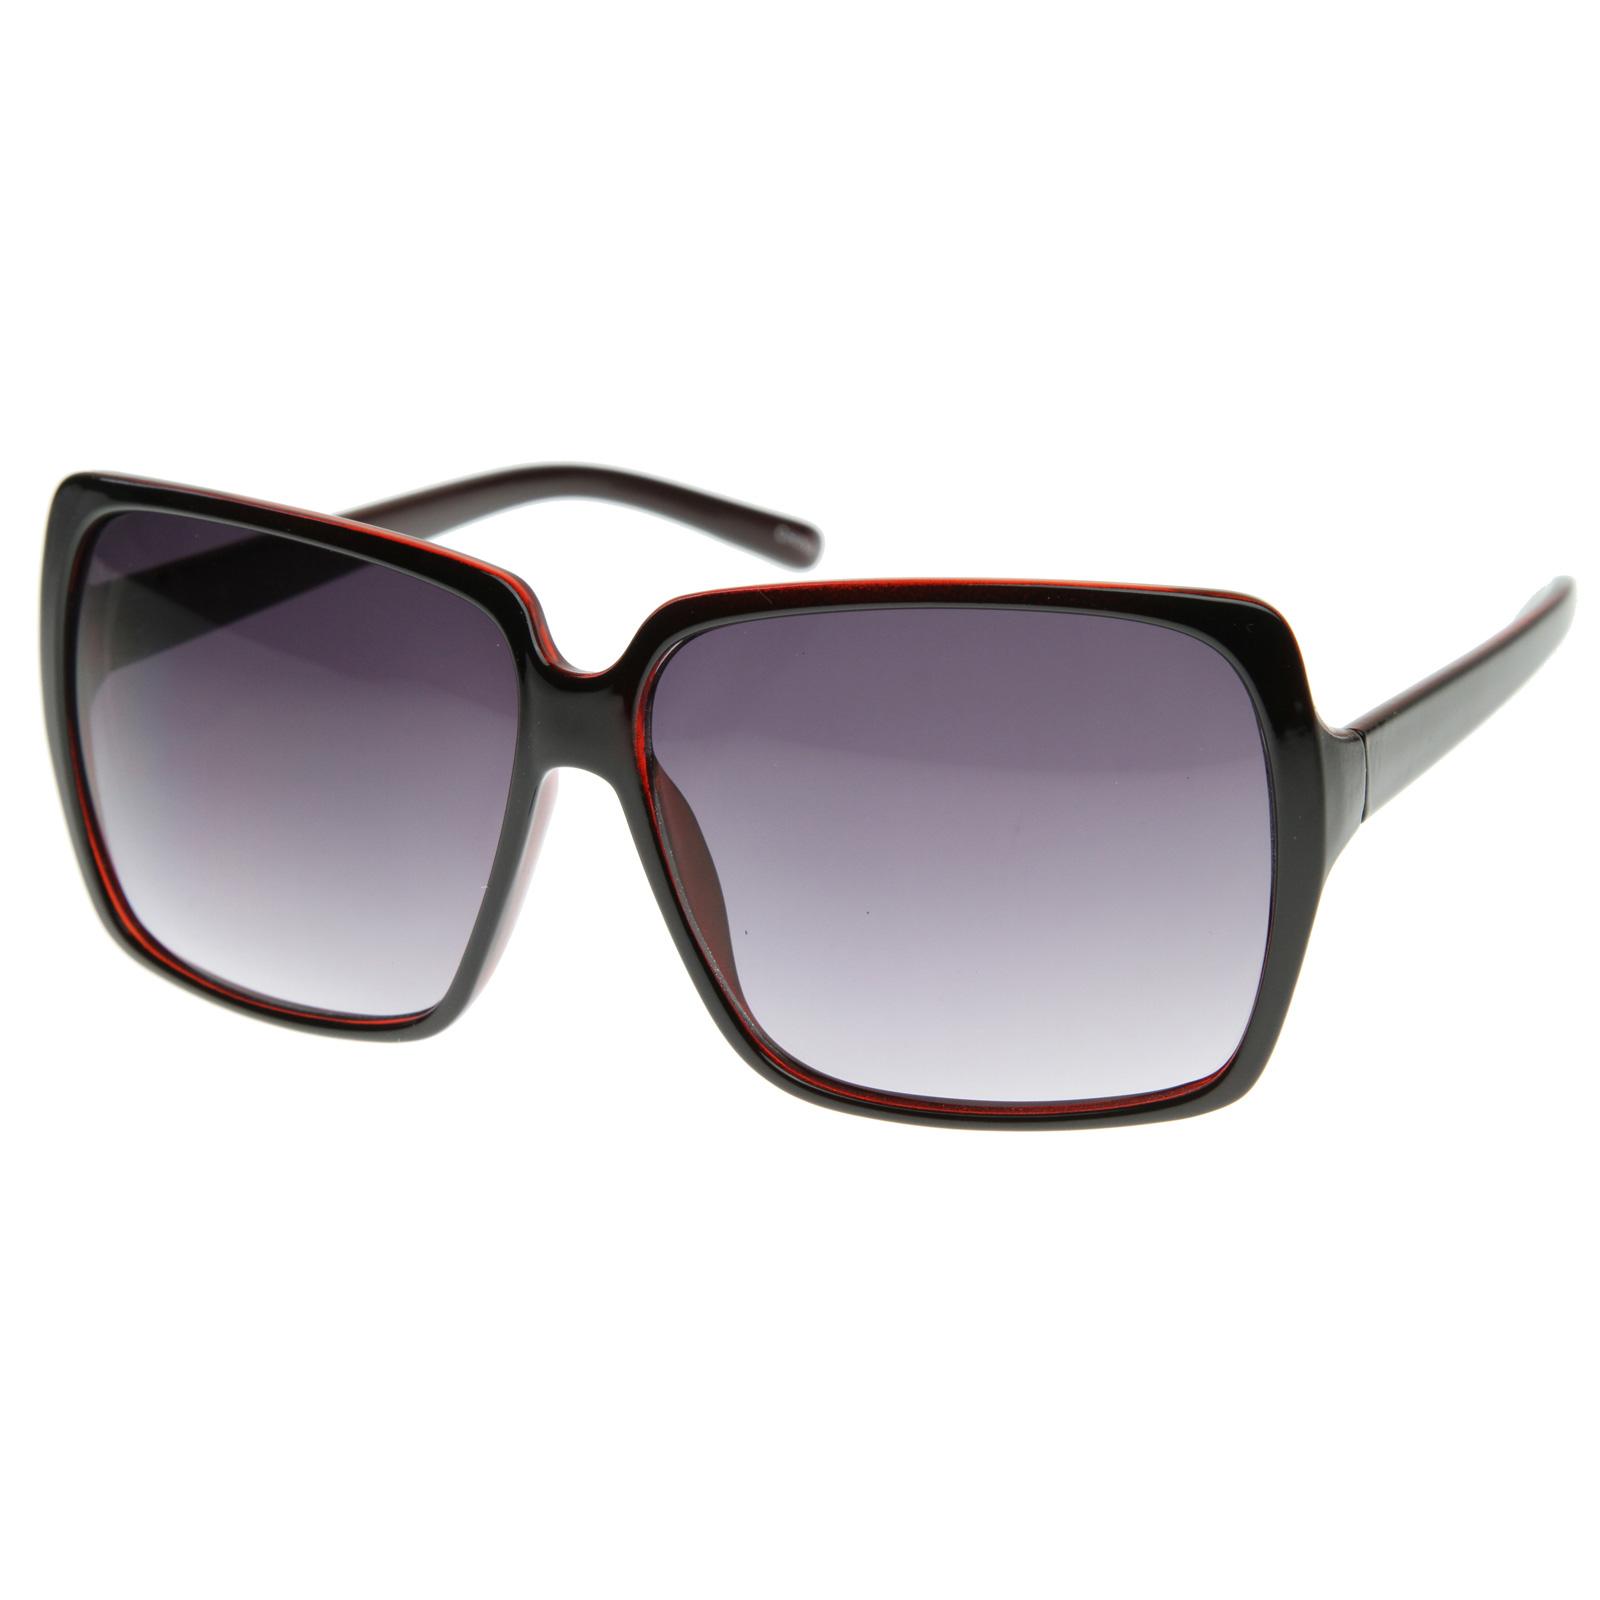 FRAME FASHION SUNGLASSES - Eyeglasses Online